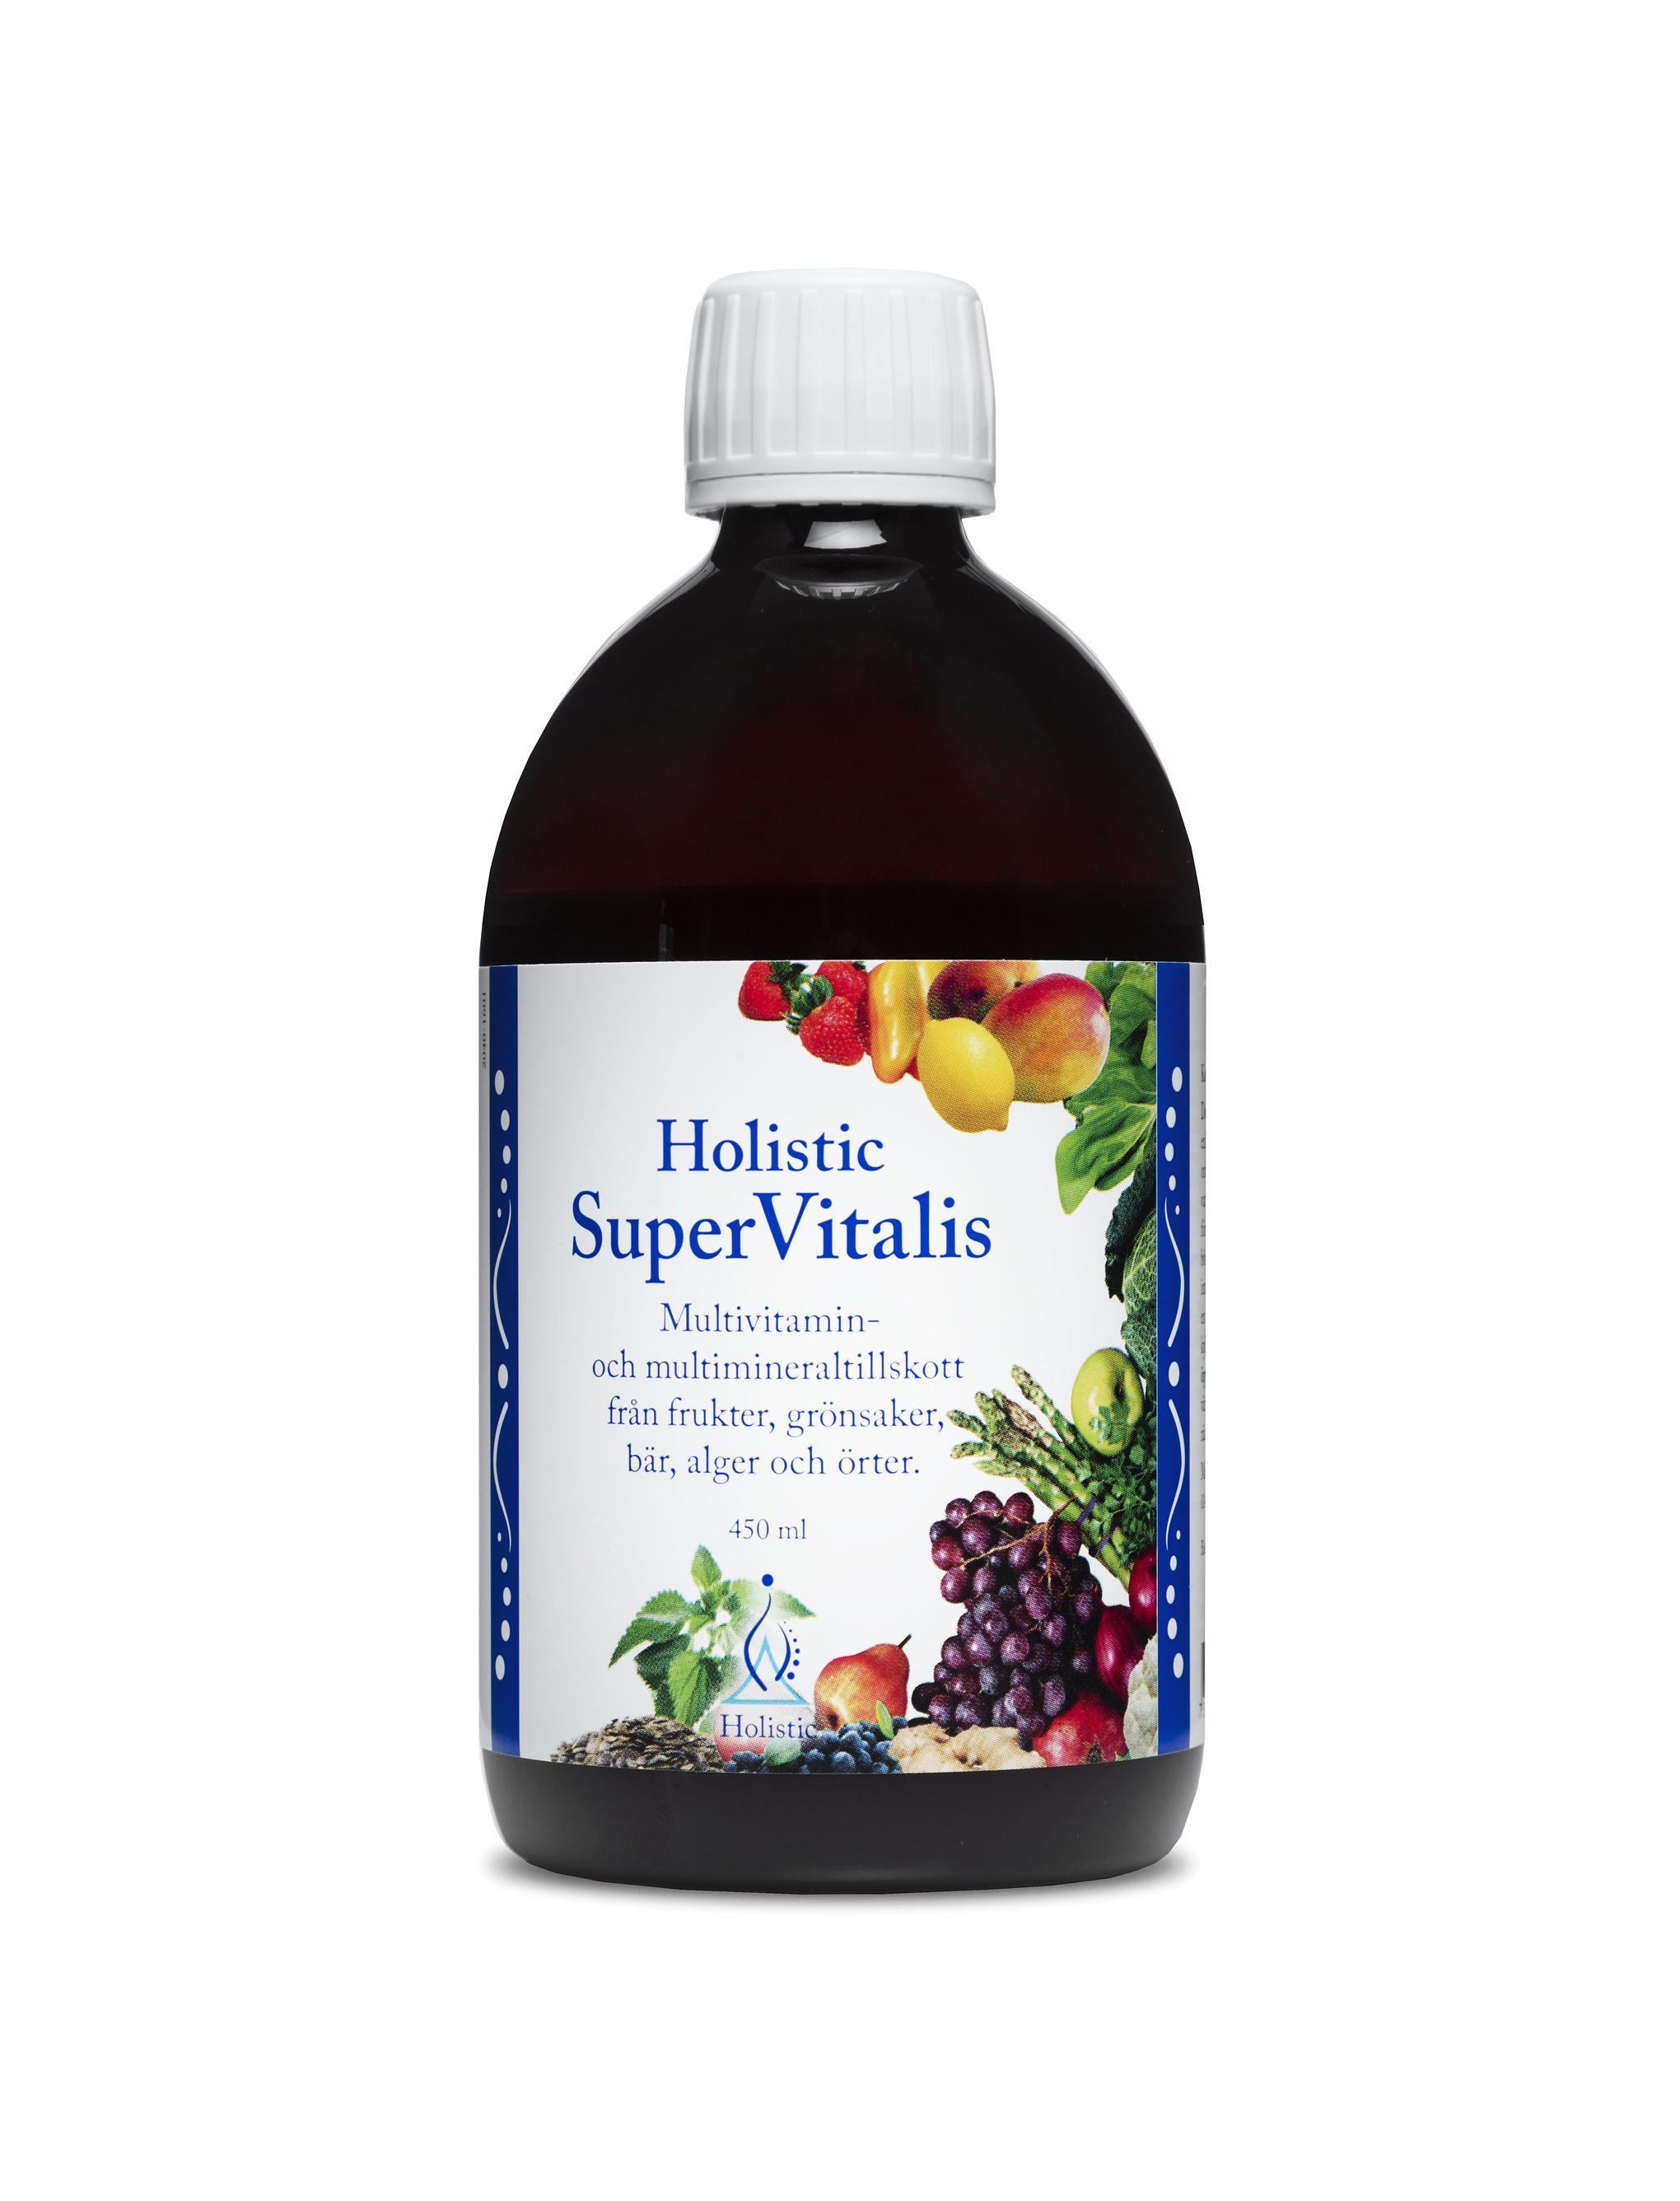 SuperVitalis